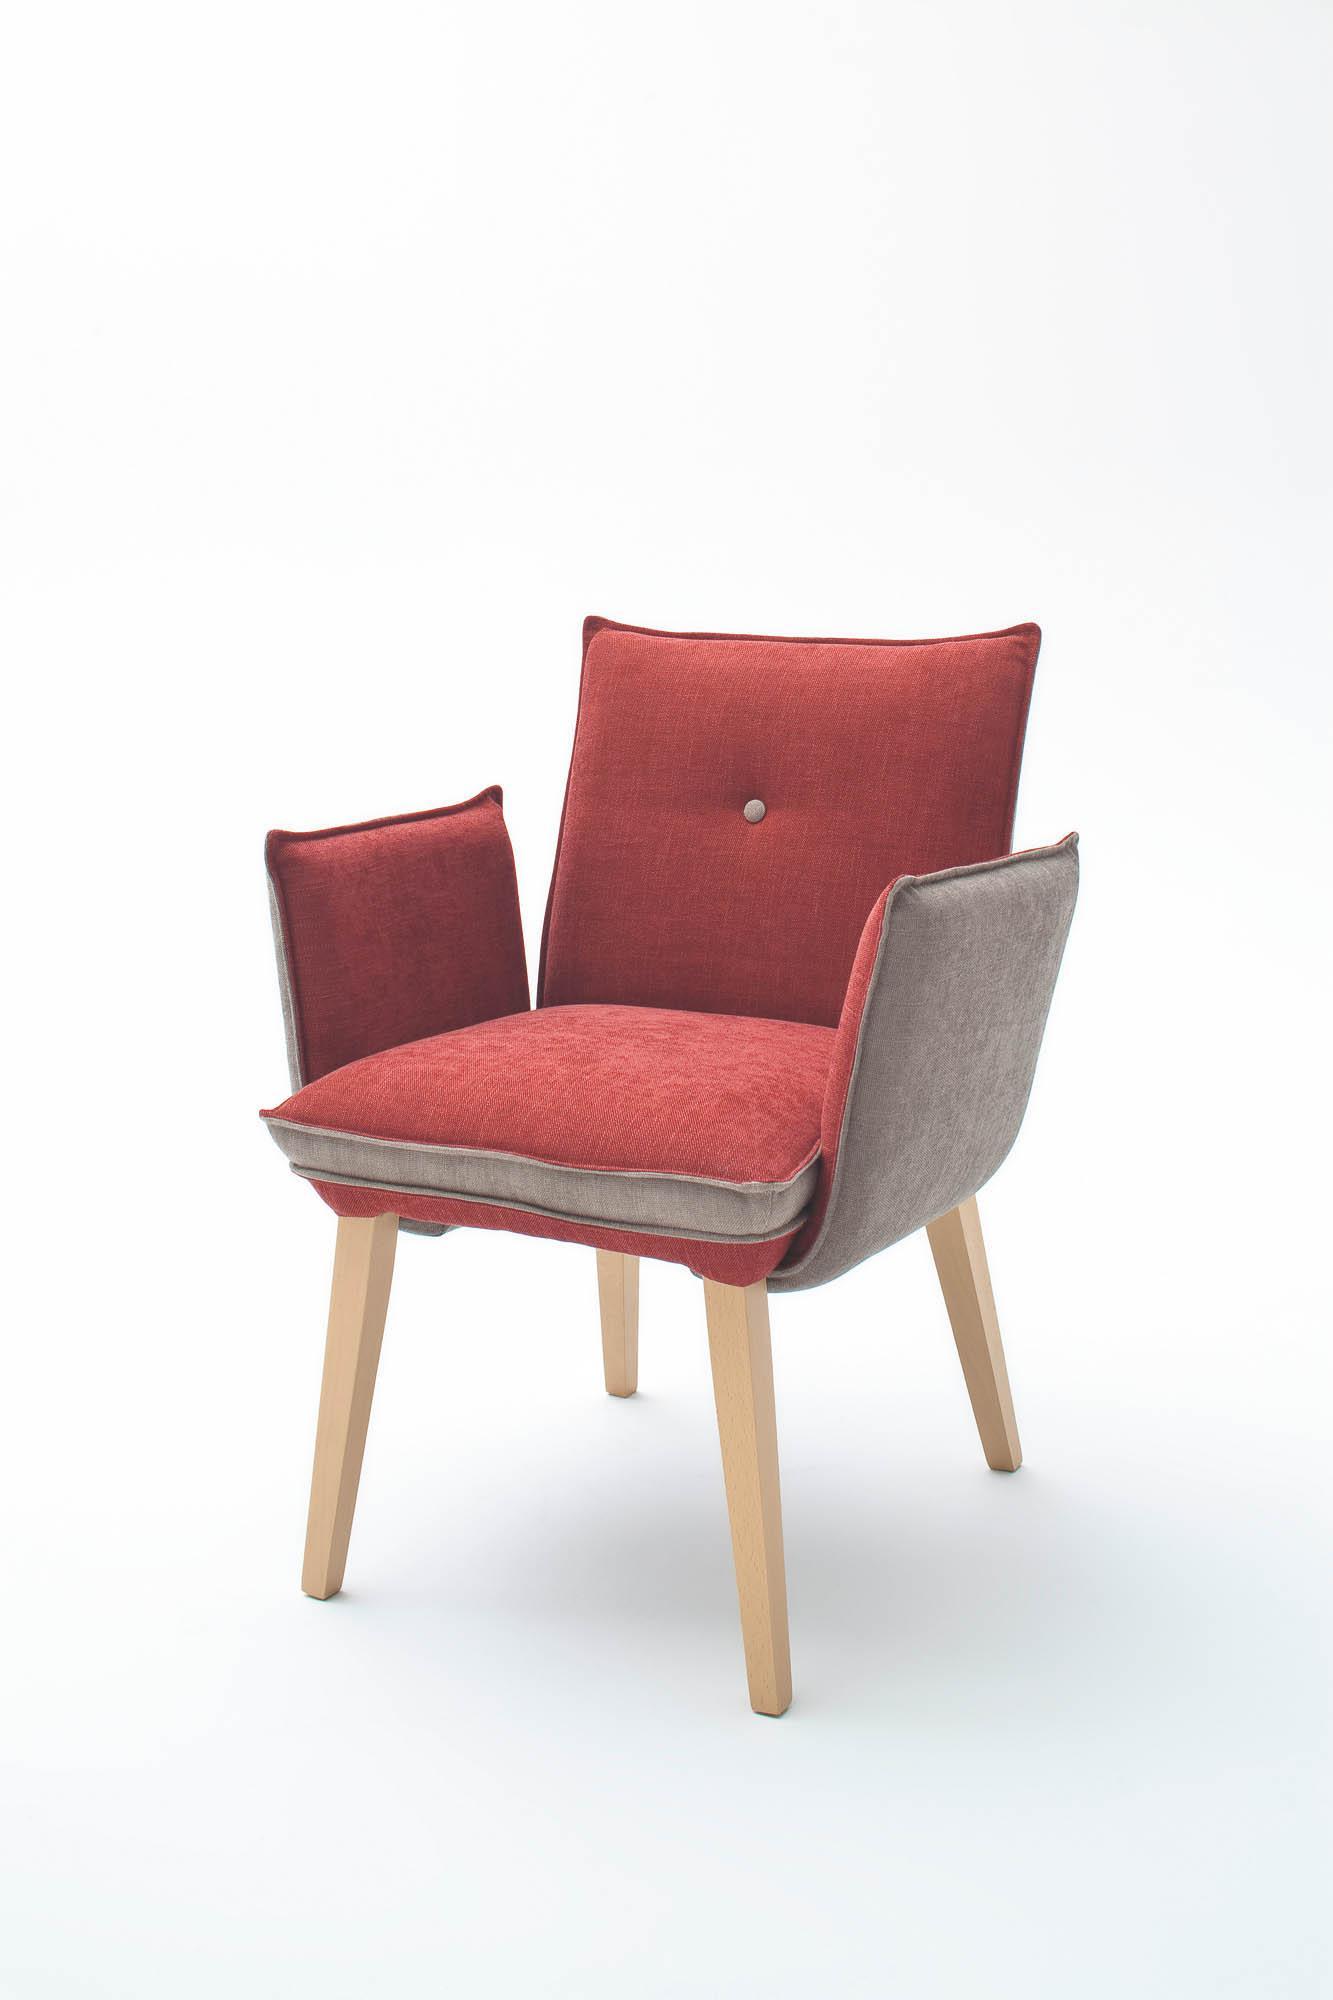 Standard Furniture Polstersessel Genua 1 und Genua 2 für